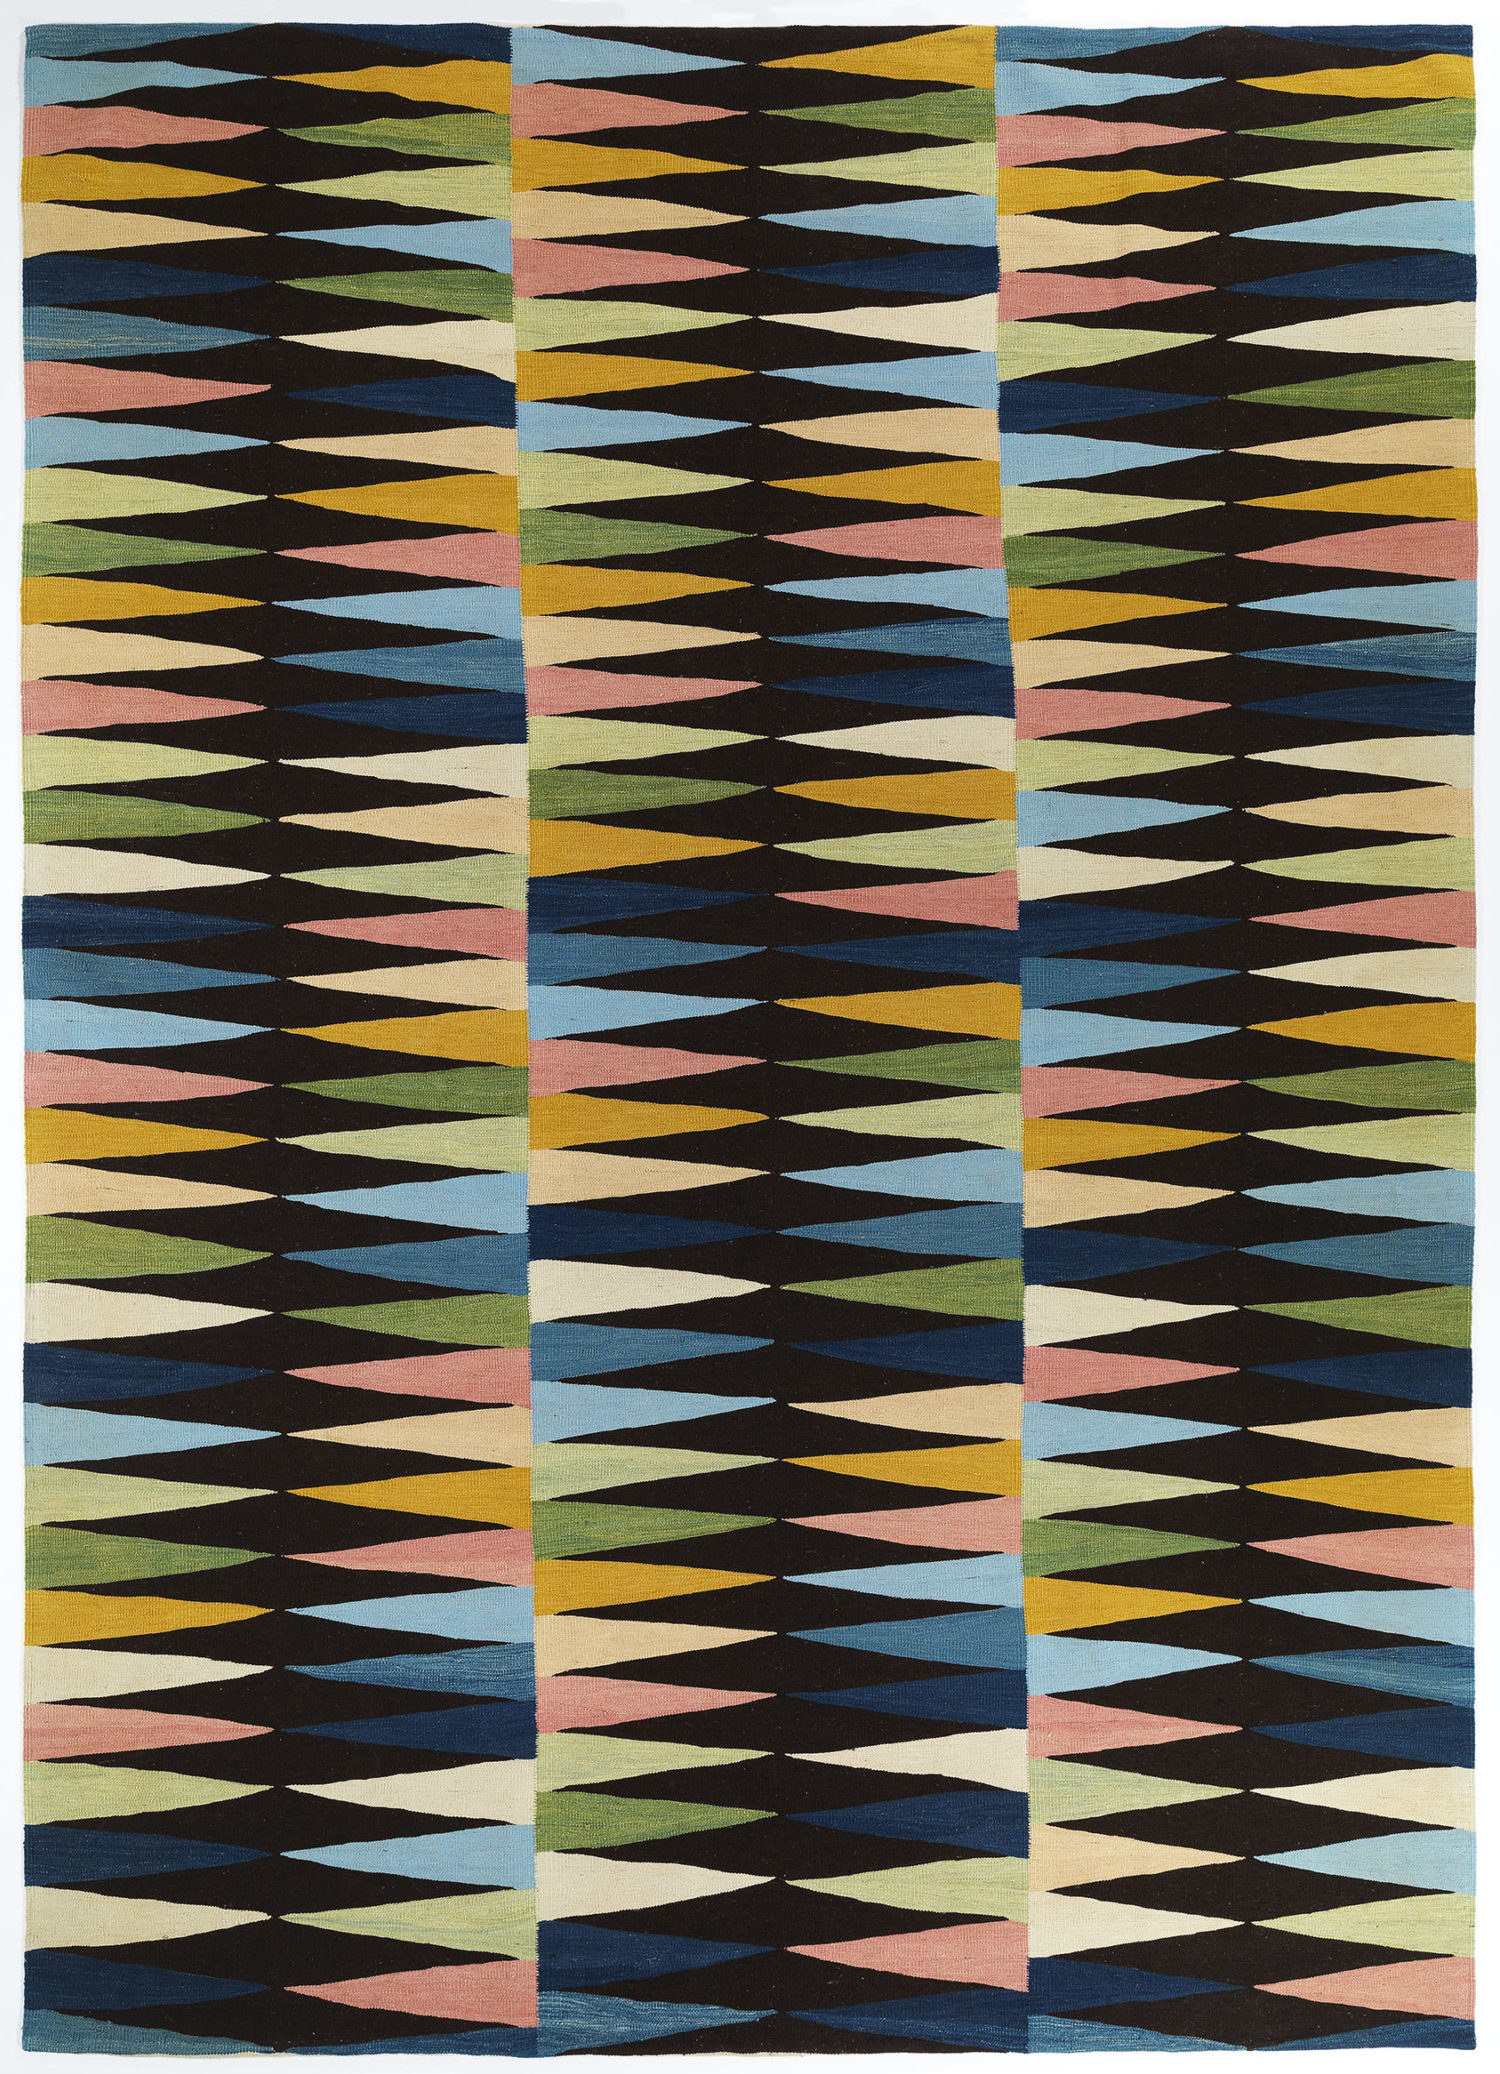 Dalga Kilims Collection - Tavla